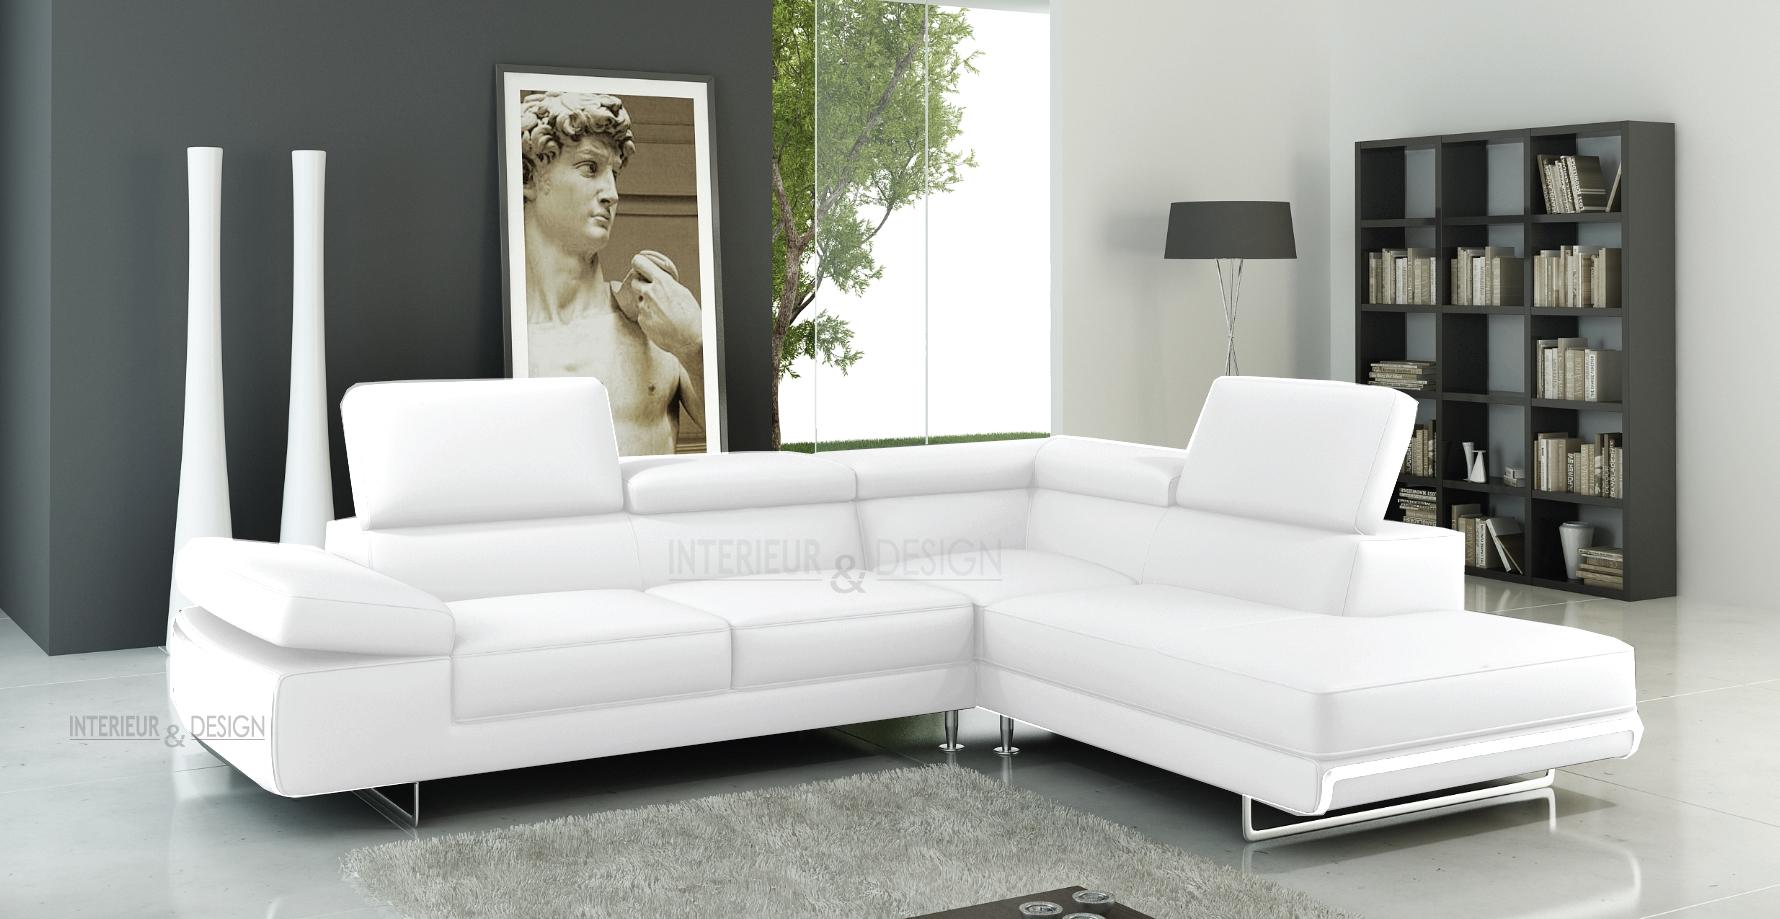 Canapé Imitation Cuir Vieilli Frais Photographie Canape D Angle Cuir Blanc Cdiscount